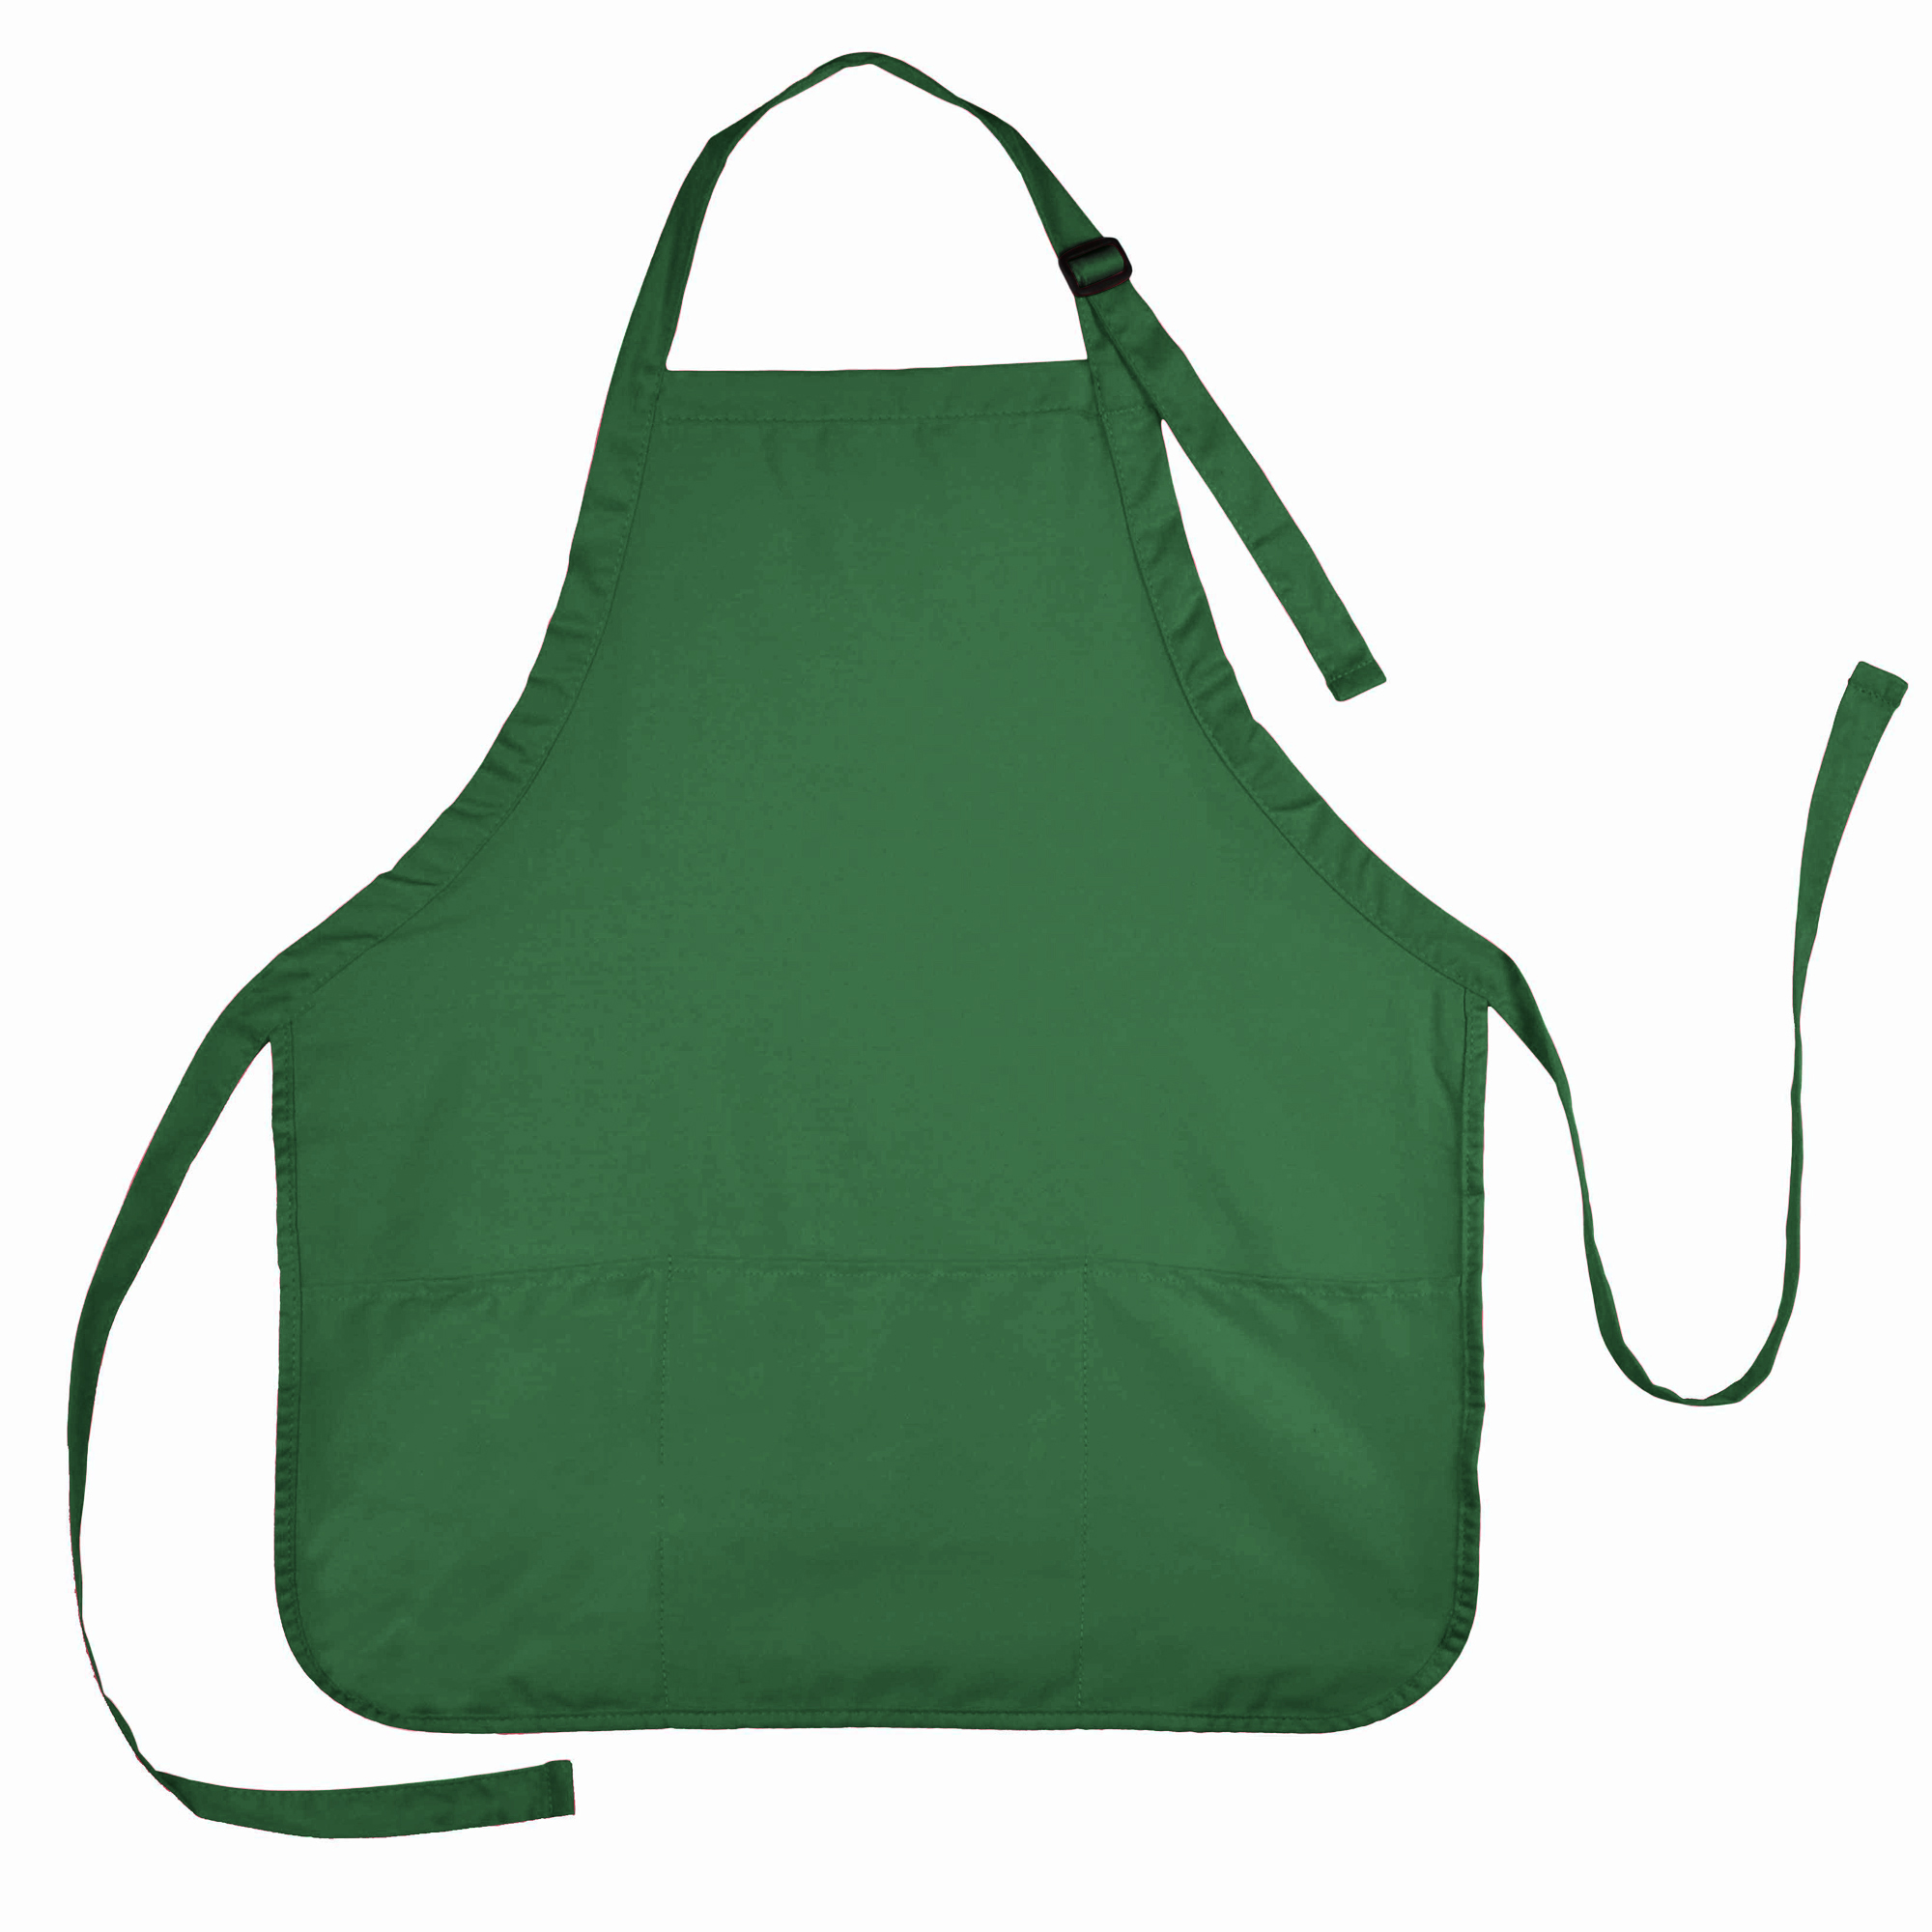 DALIX Apron Commercial Restaurant Home Bib Spun Poly Cotton Kitchen Aprons (3 Pockets) in Dark Green